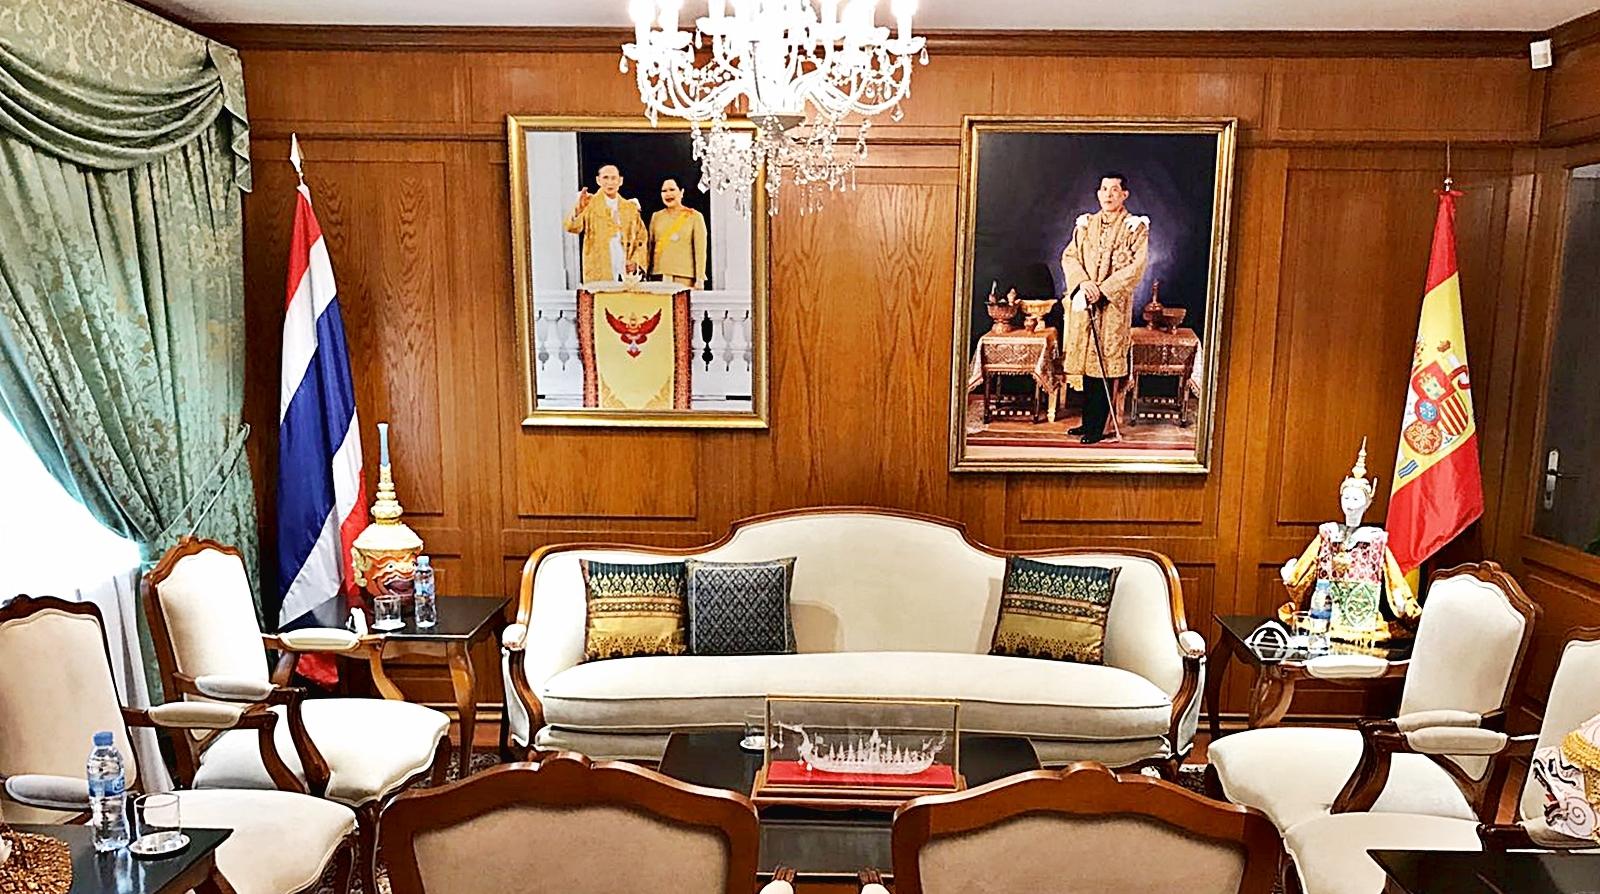 Real Embajada de Tailandia, Madrid.